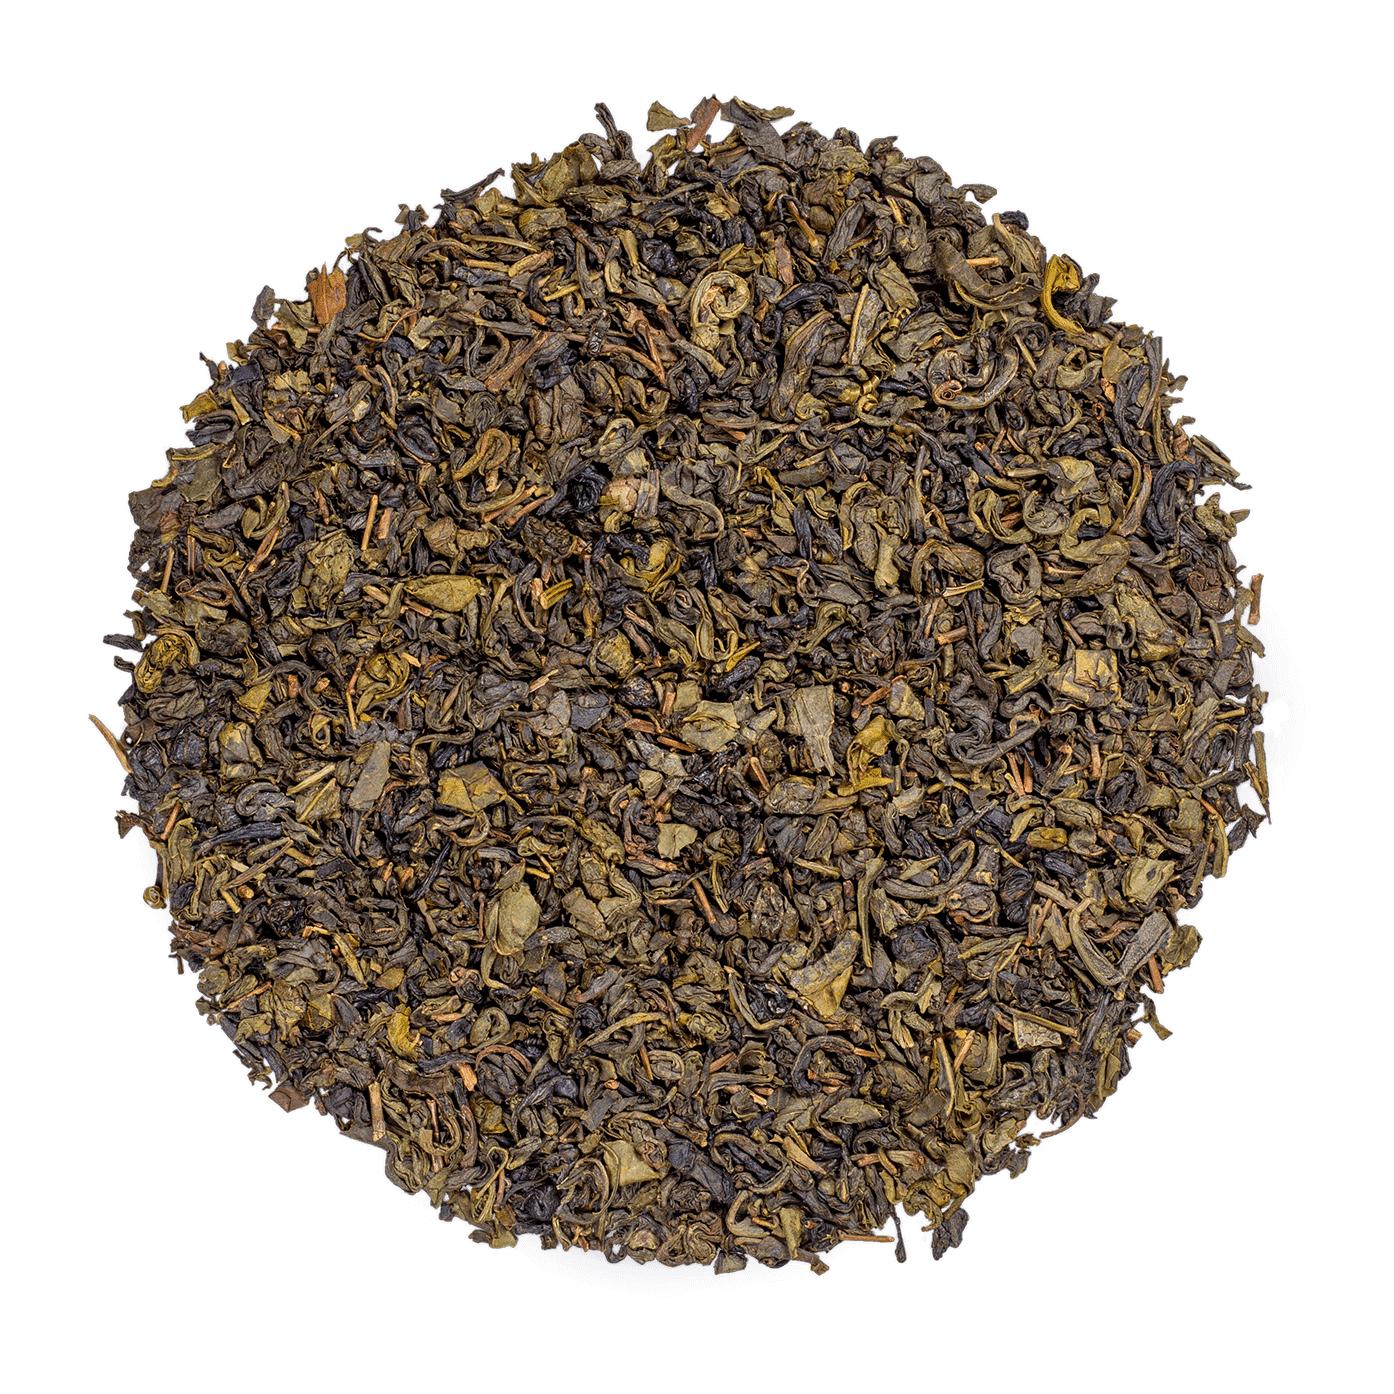 KUSMI TEA Vert Bouquet bio - Thé vert, bergamote, fleur - Kusmi Tea